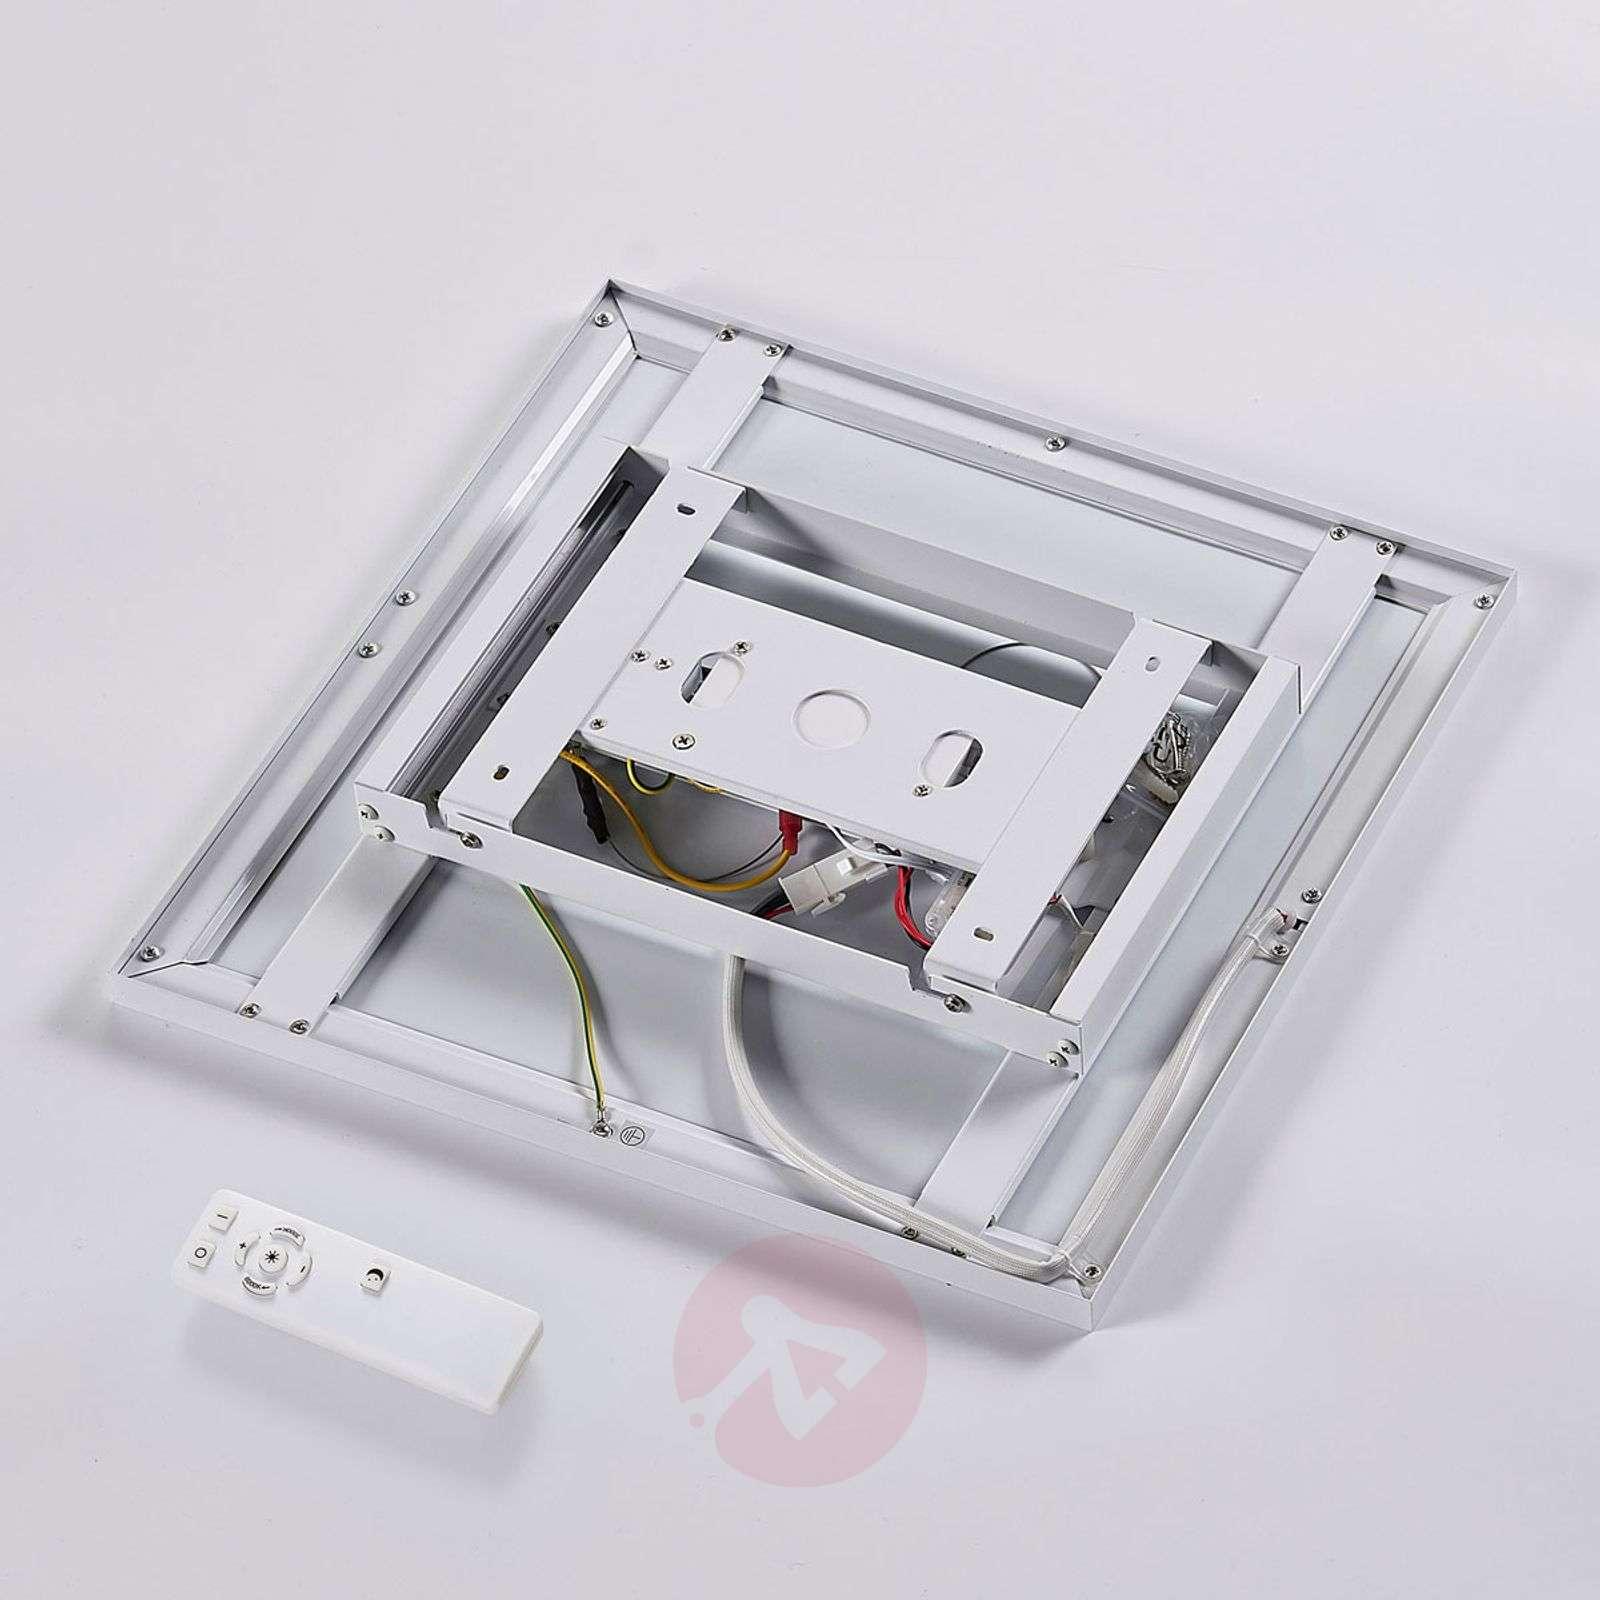 Square LED panel Philia, 40 cm 3,000K-6,000K-9621212-011